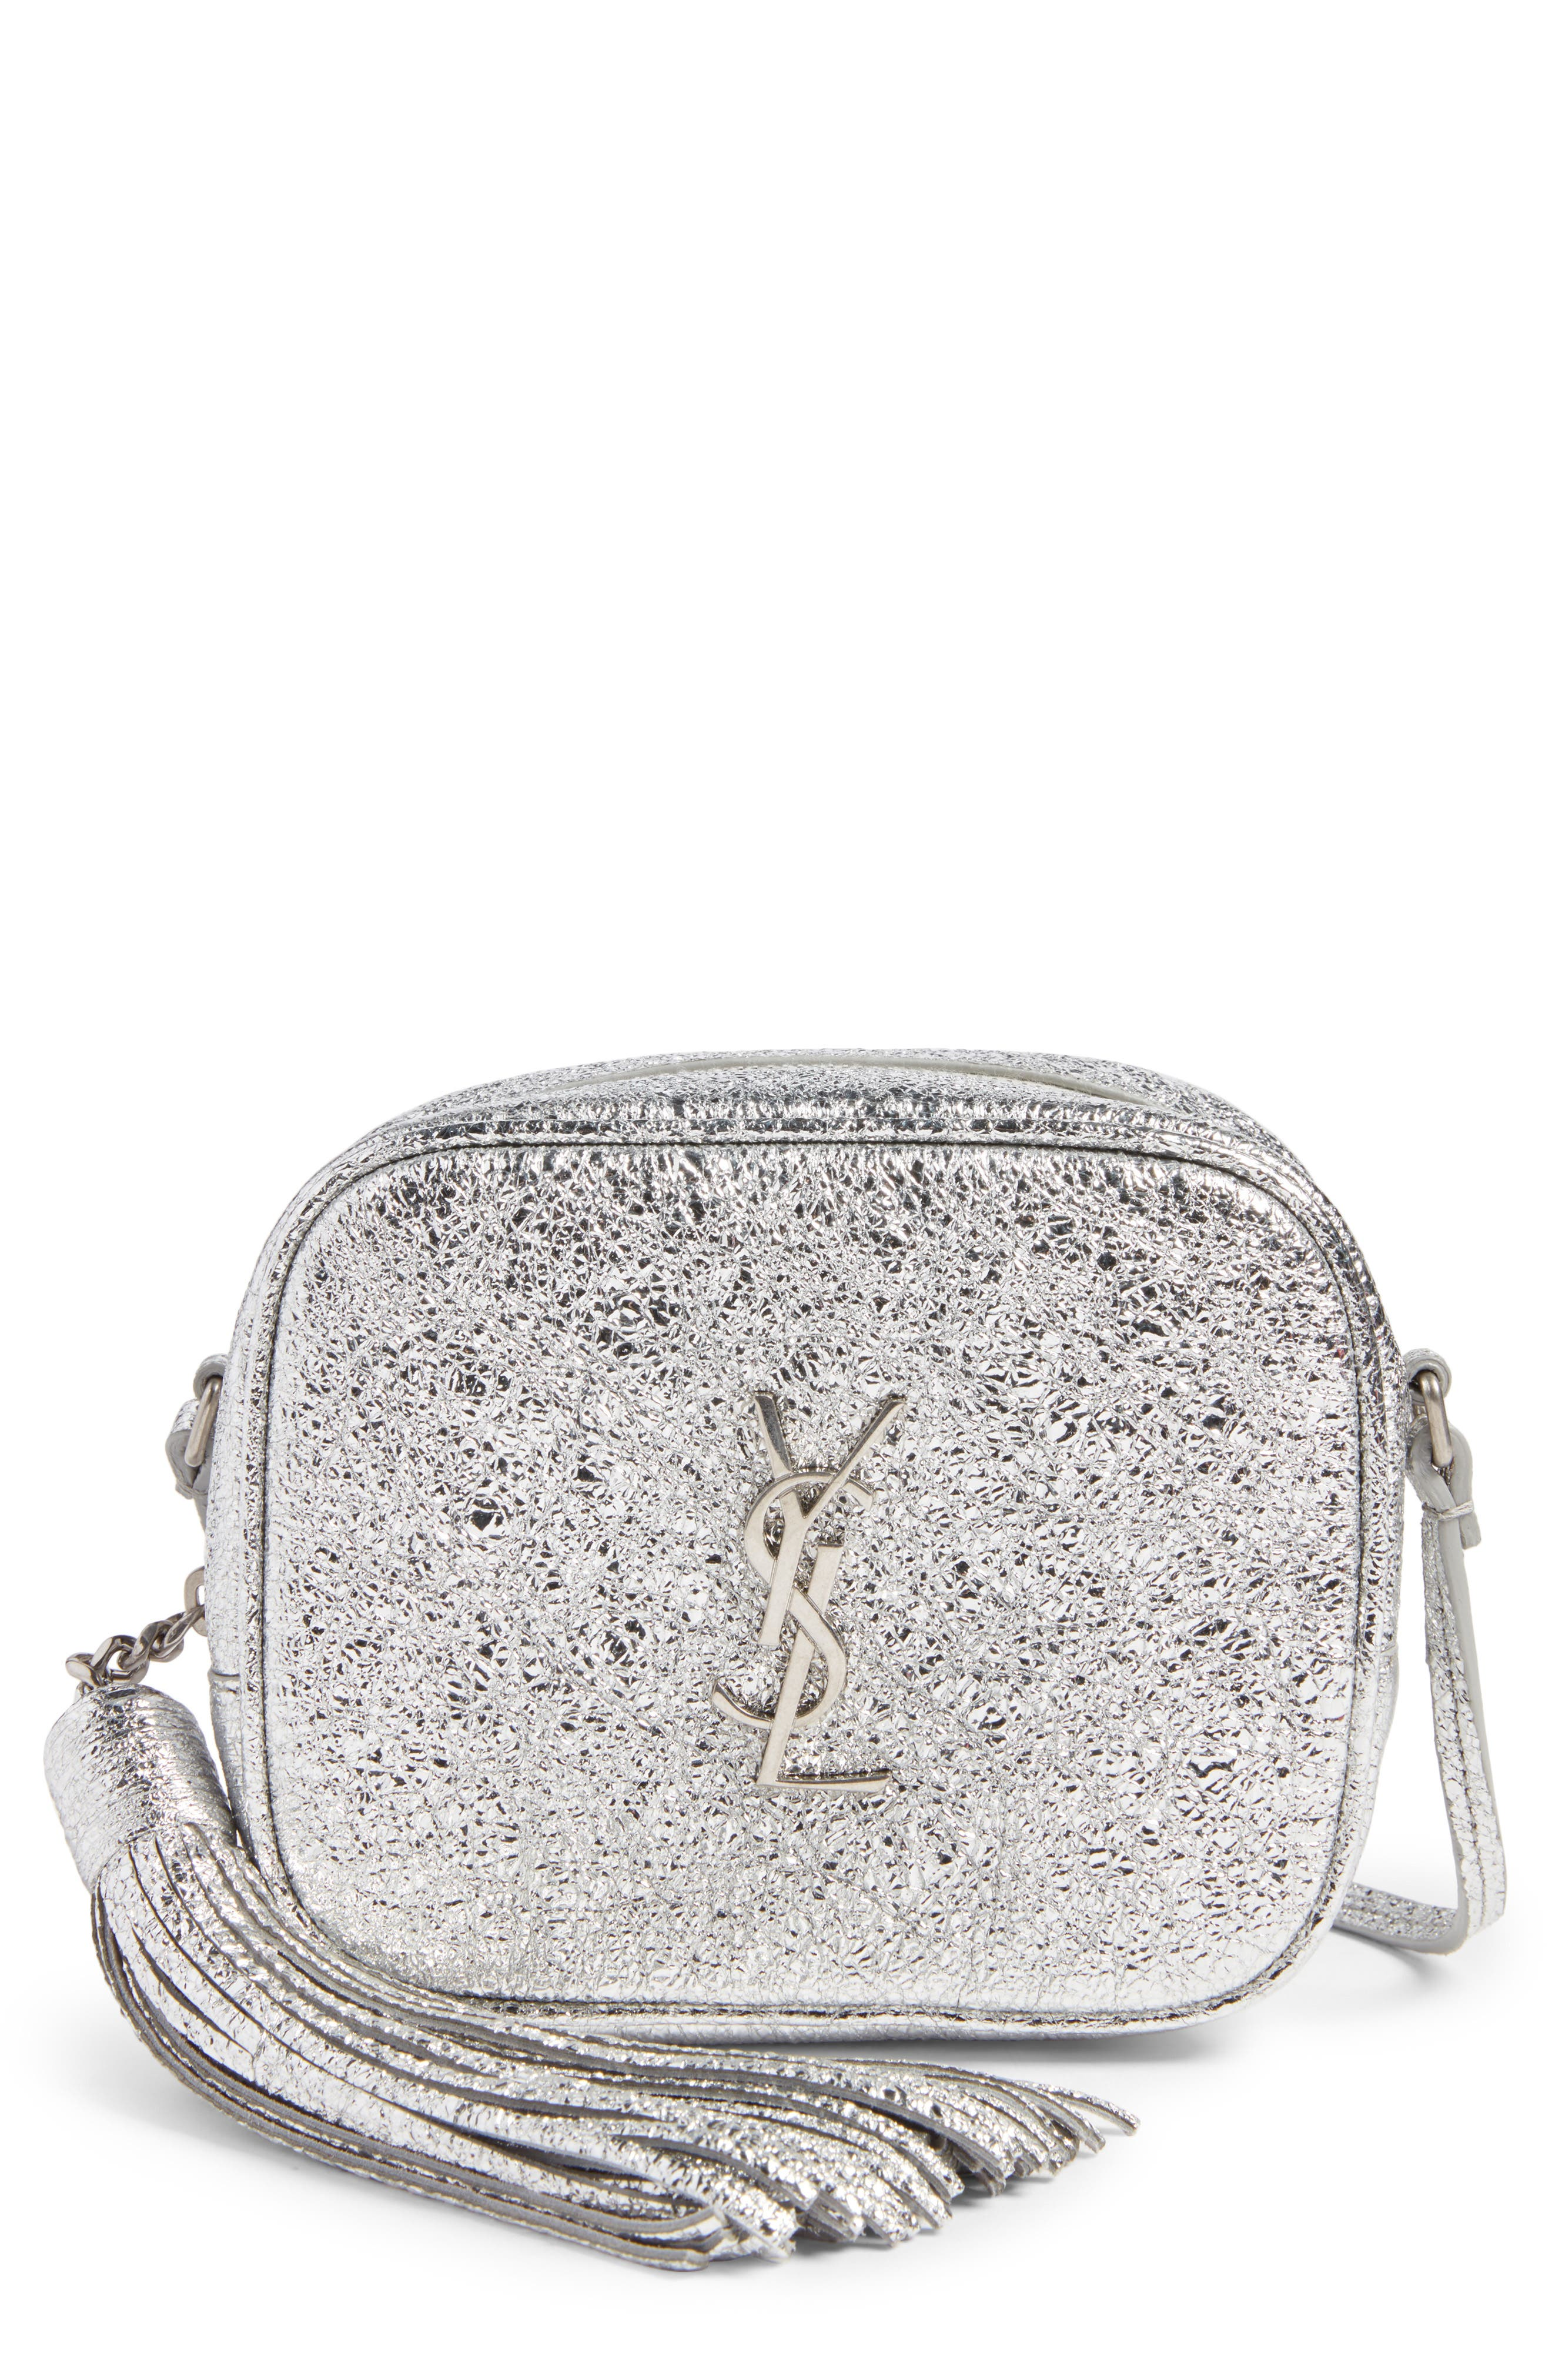 Main Image - Saint Laurent Monogram Blogger Calfskin Crossbody Bag